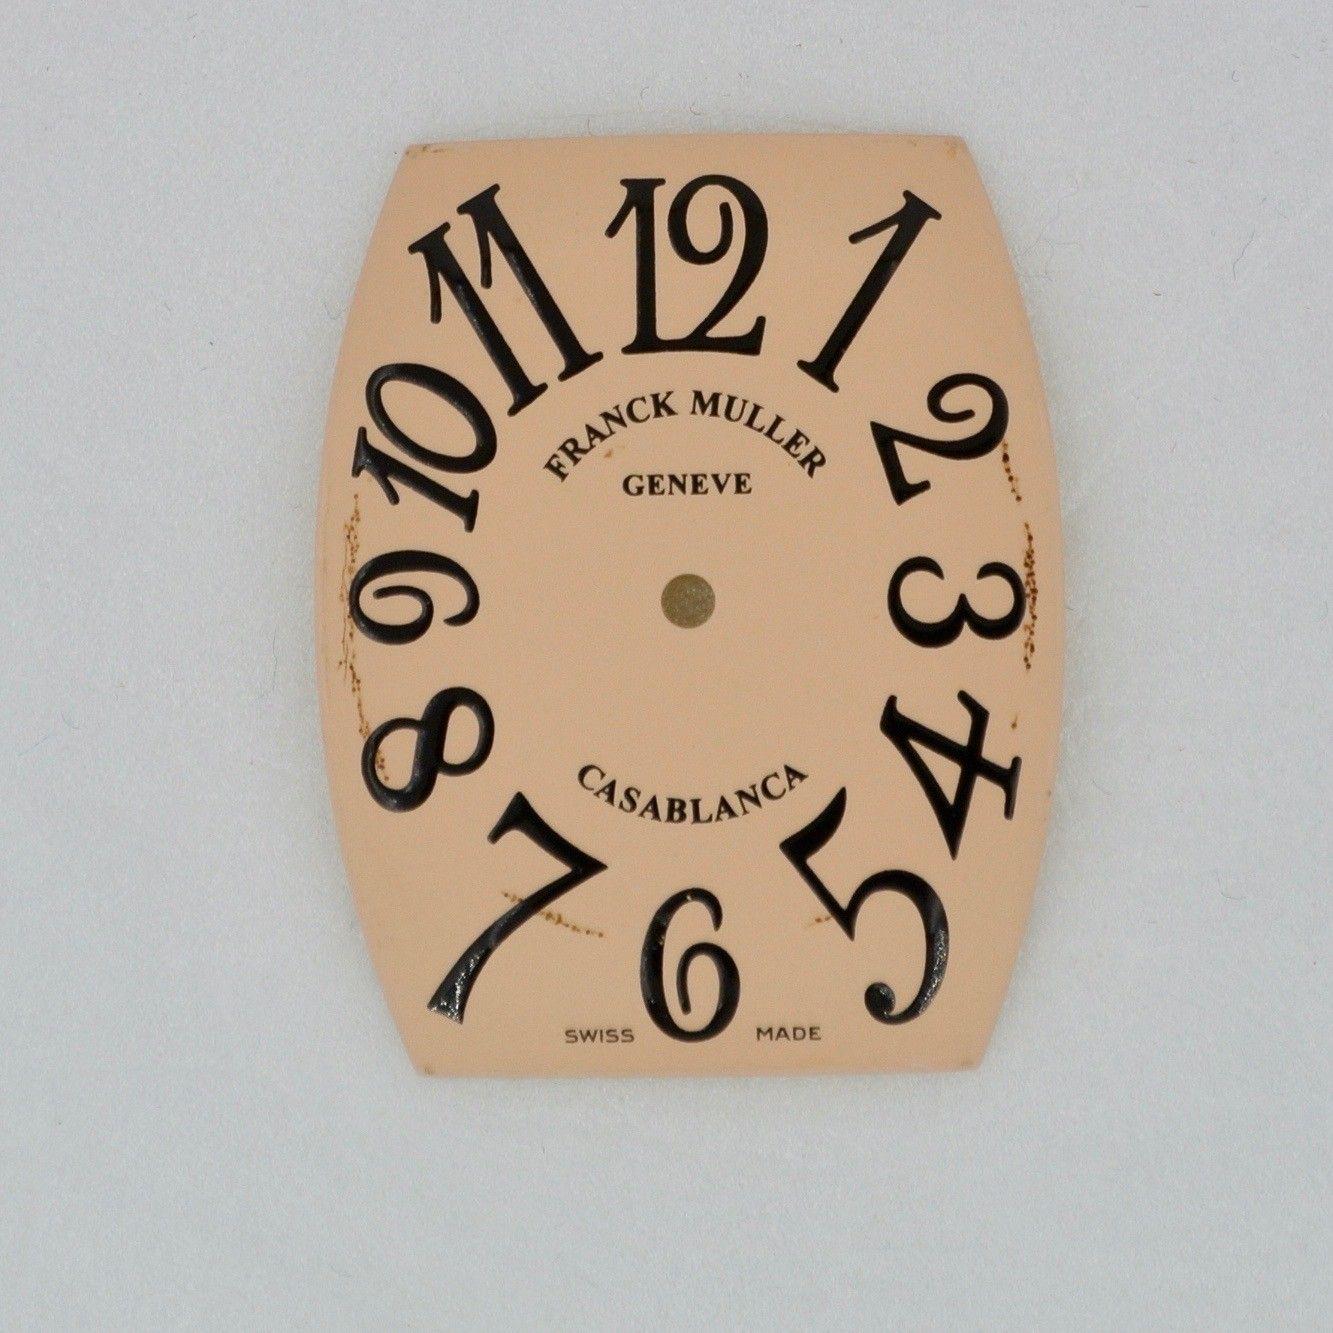 Quadrante Franck Muller Casablanca 6850